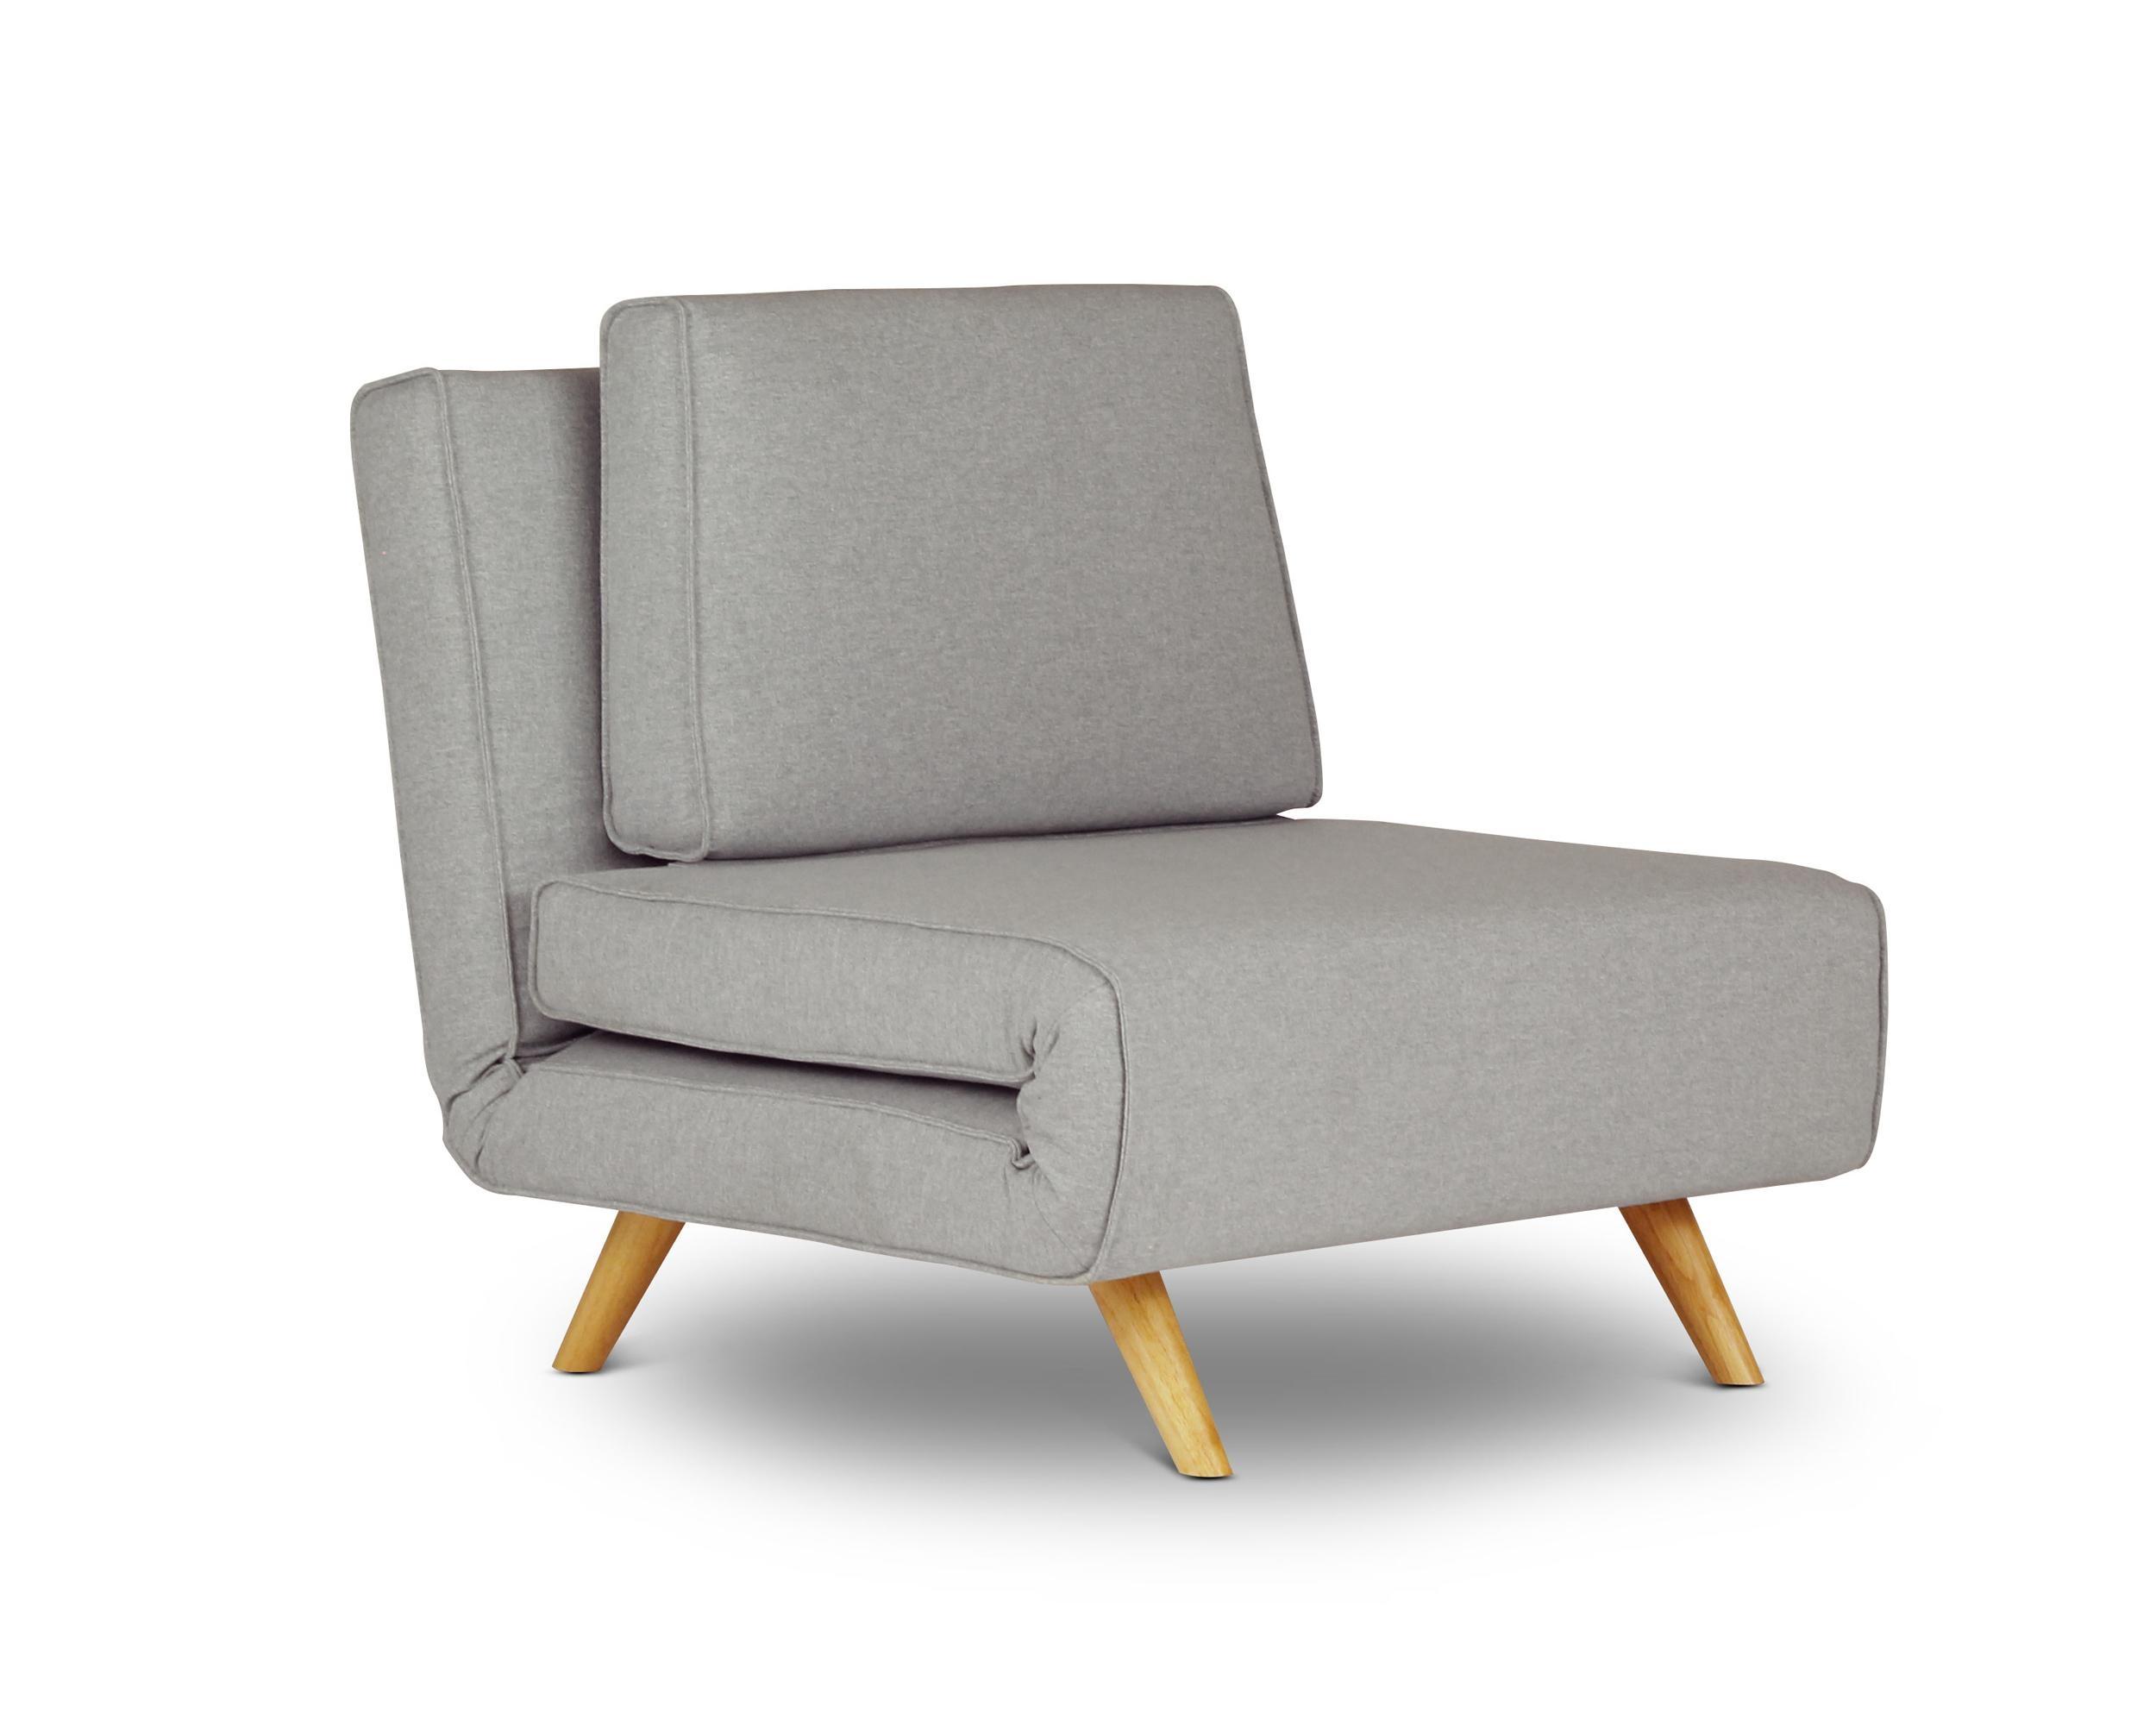 Sofas Center : Sofa Single Size Literarywondrous Chair Picture Within Slipper Sofas (Image 18 of 20)